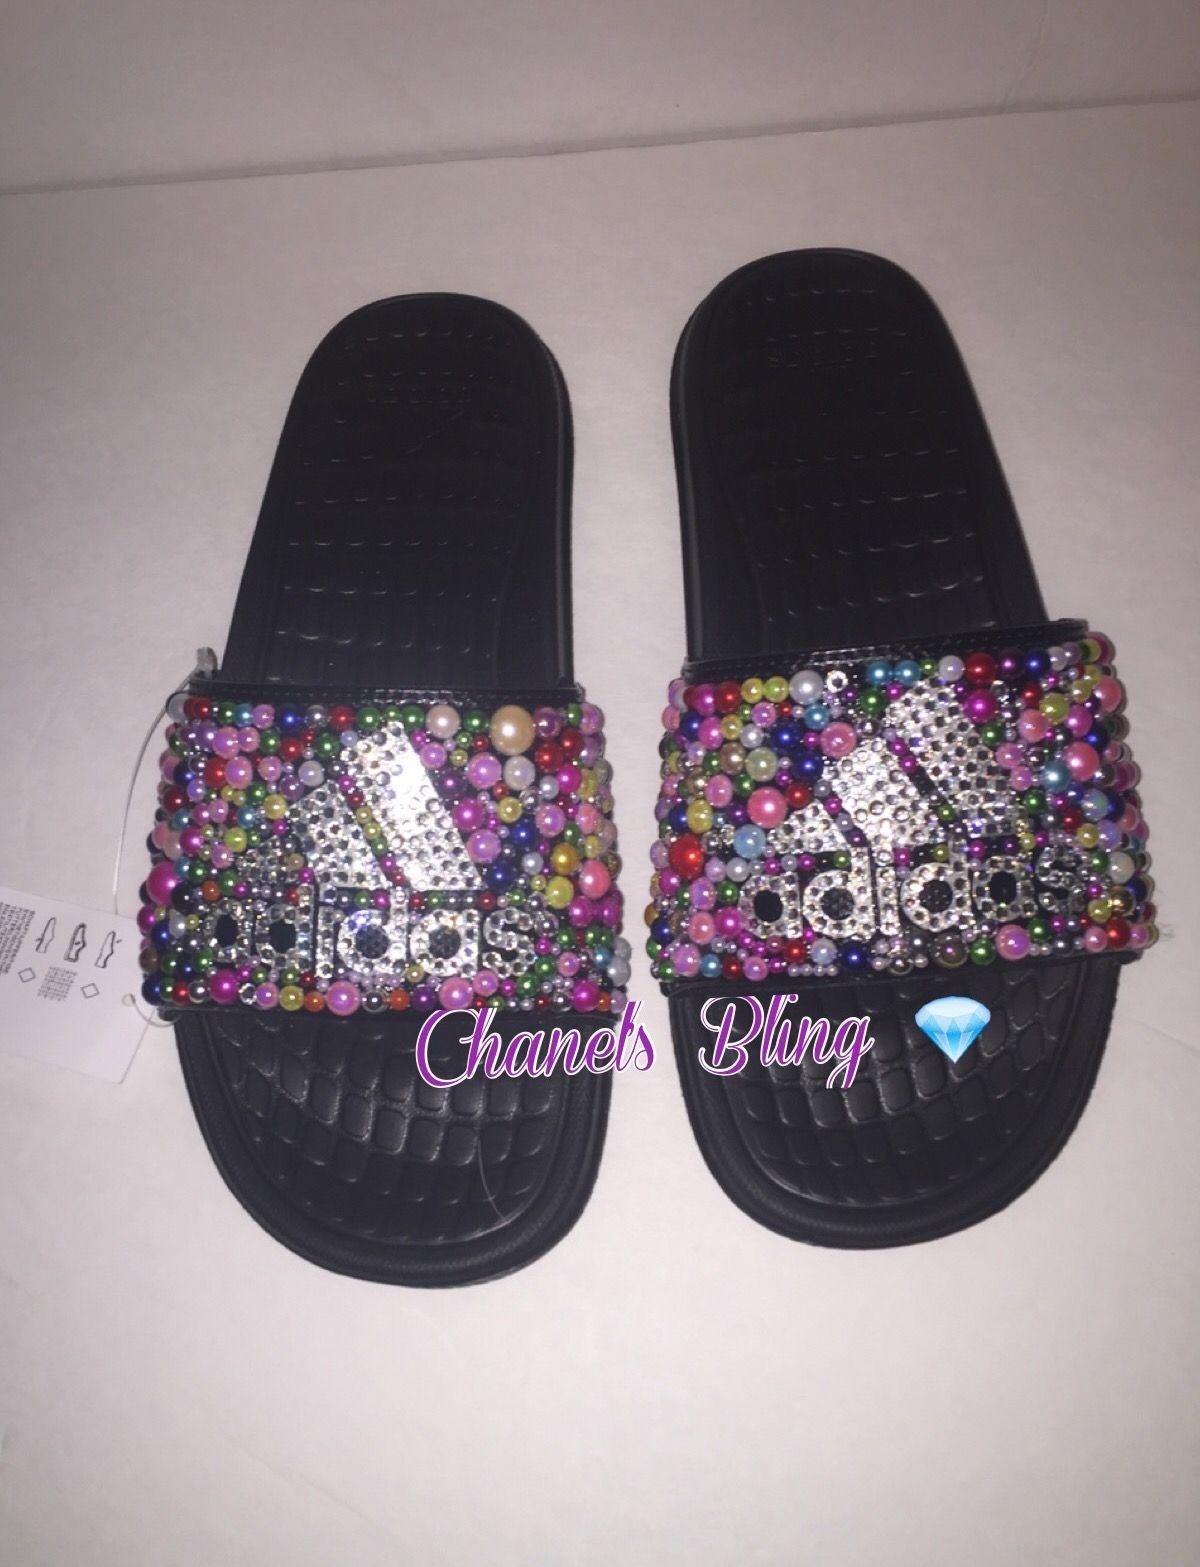 eadc6fc50 Custom Adidas Bling Flip Flops Slides | fashion in 2019 | Shoes ...